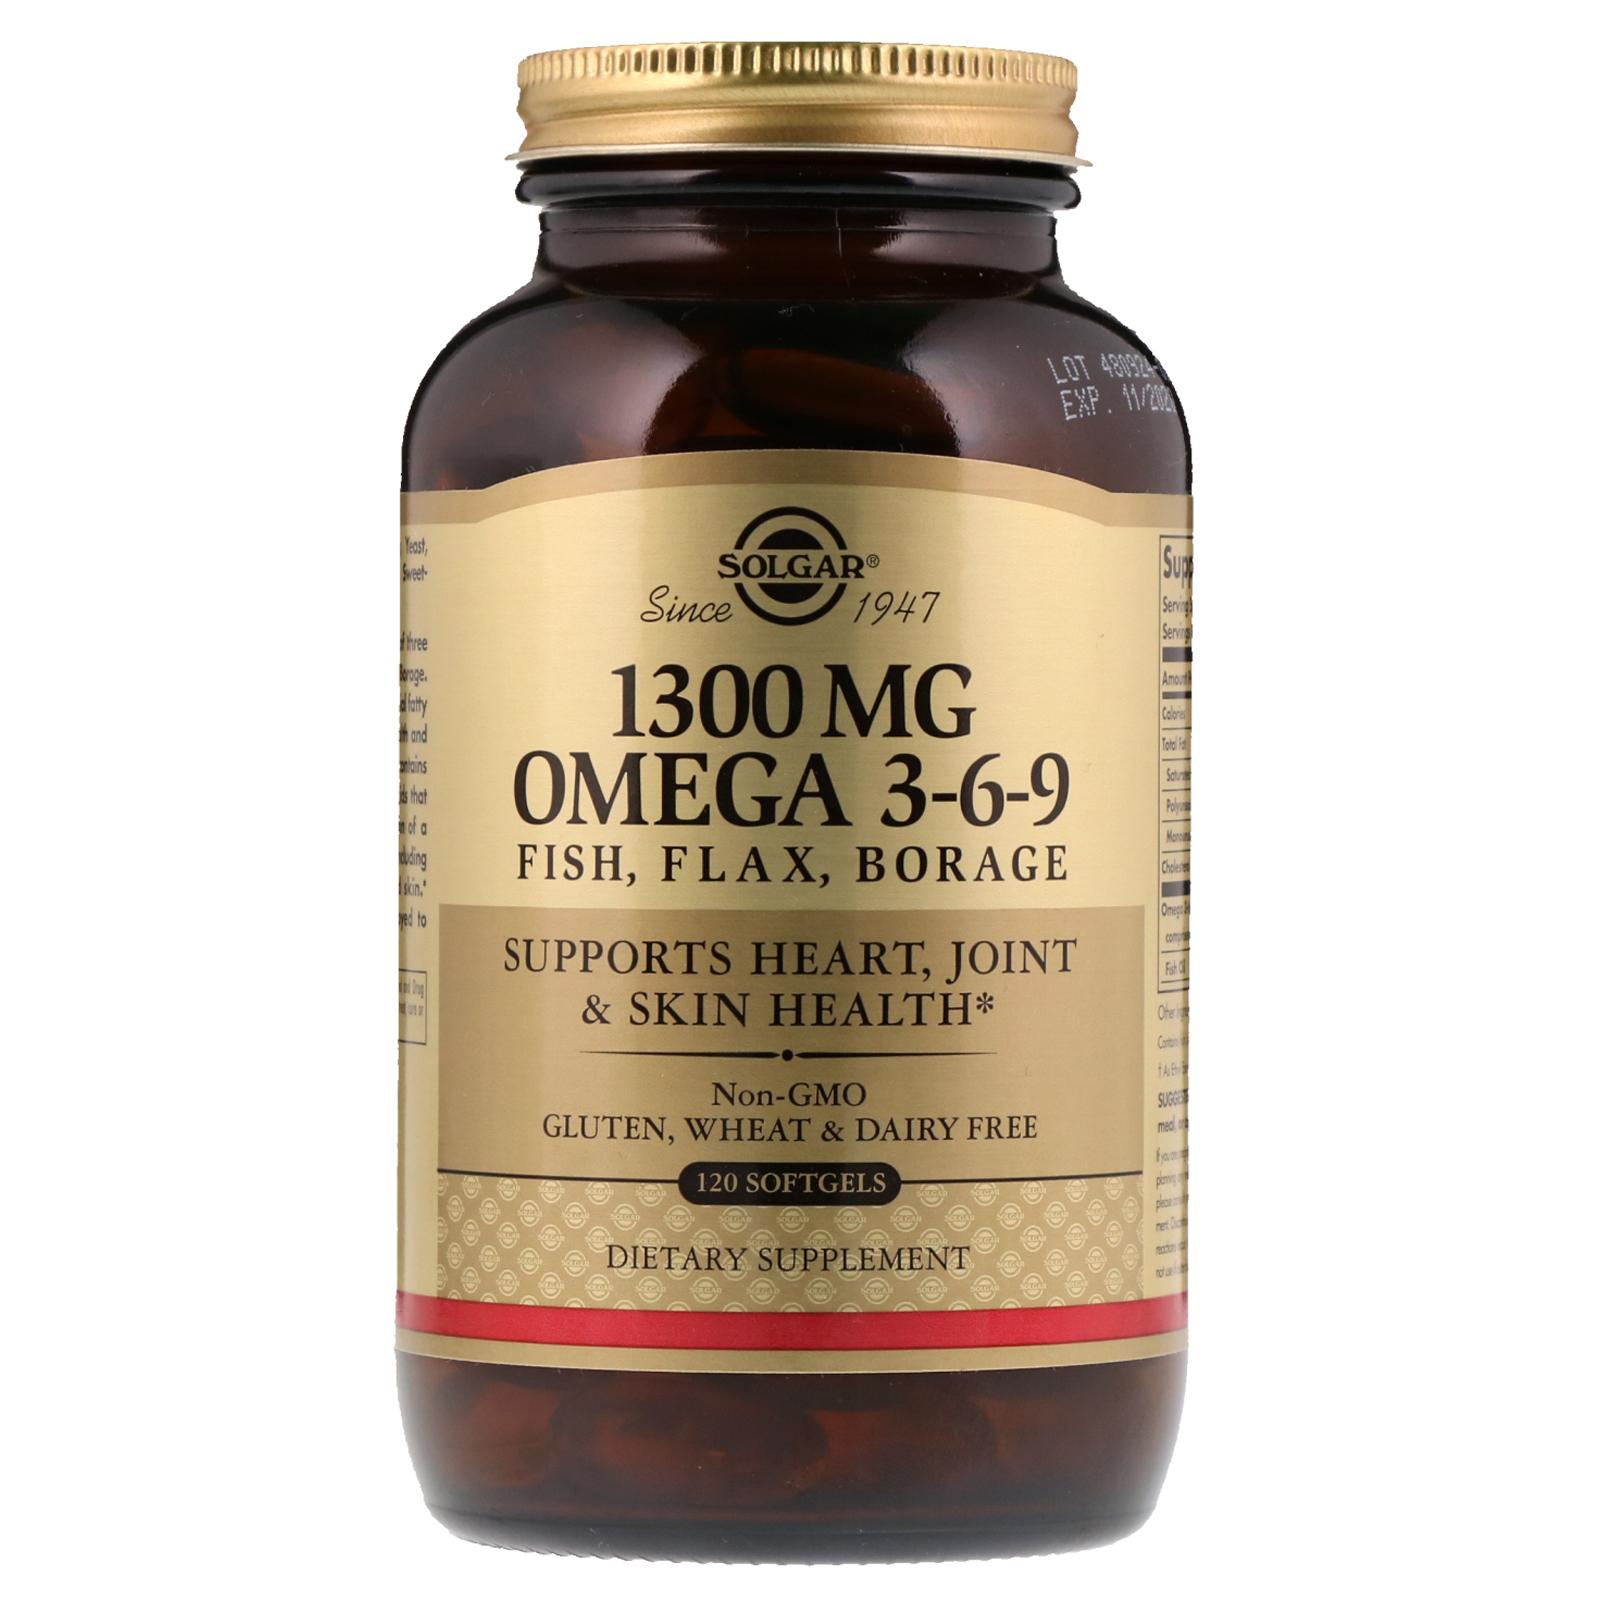 Solgar, EFA, Omega 3-6-9, 1300 Mg, 120 Softgels